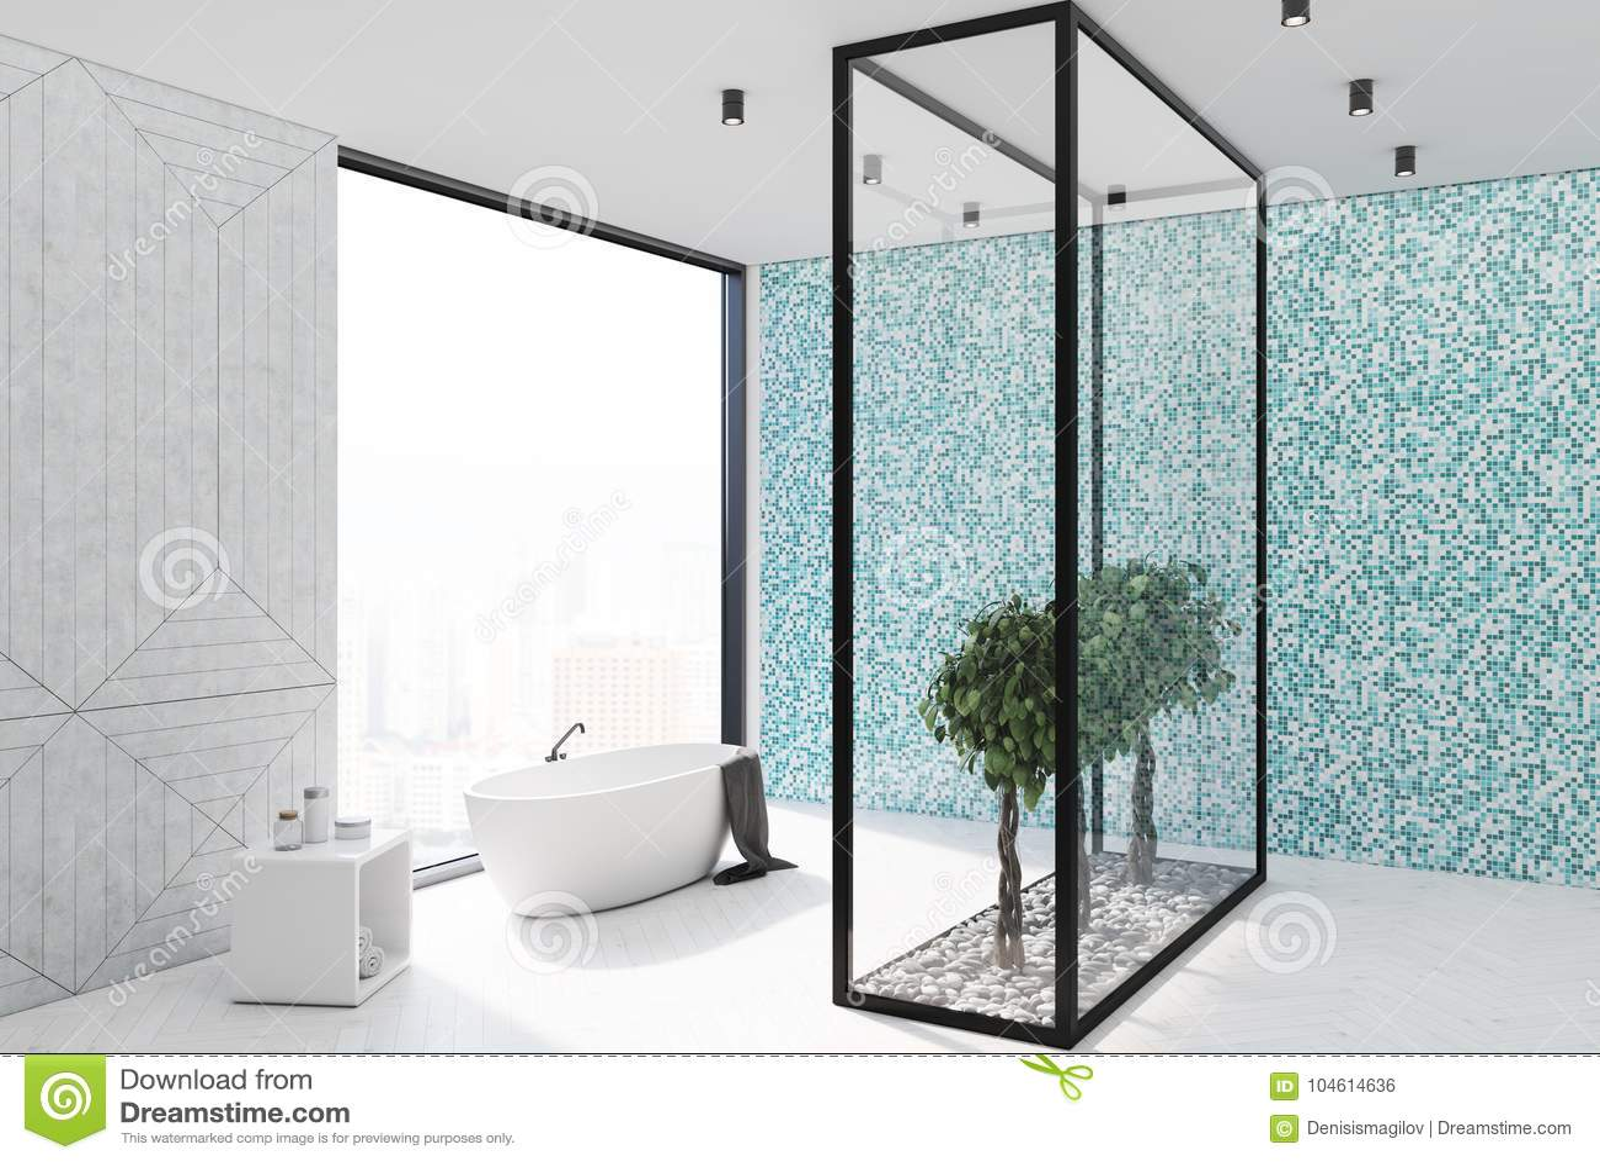 Blue tile bathroom corner stock illustration. Illustration of empty ...